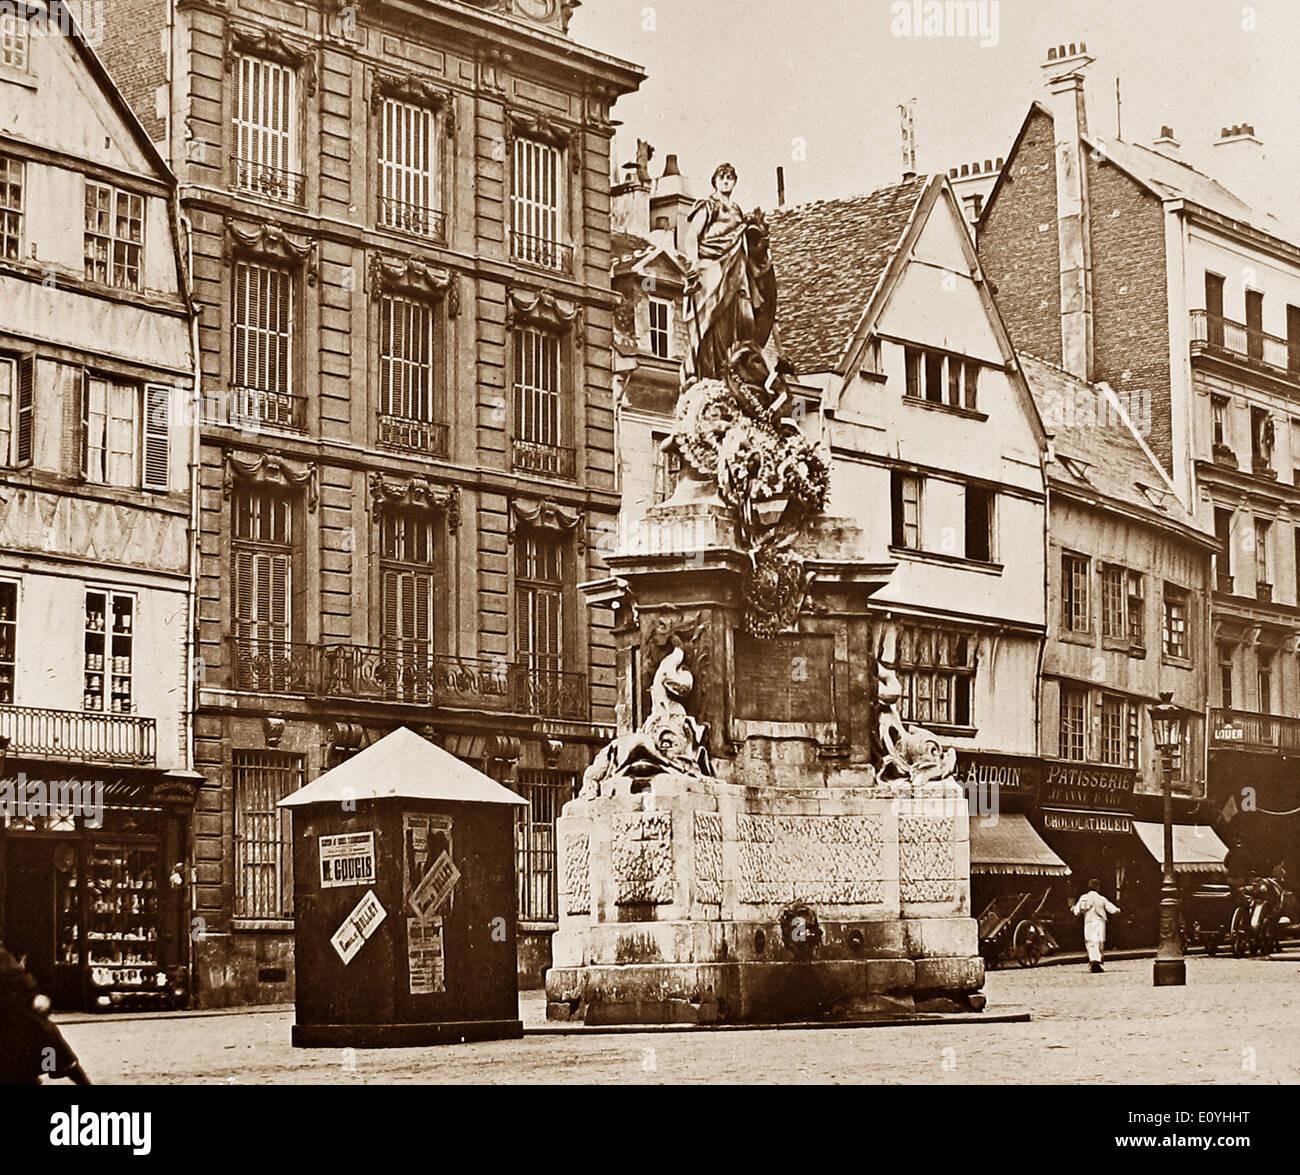 Joan of Arc Statue Rouen France pre-1900 - Stock Image